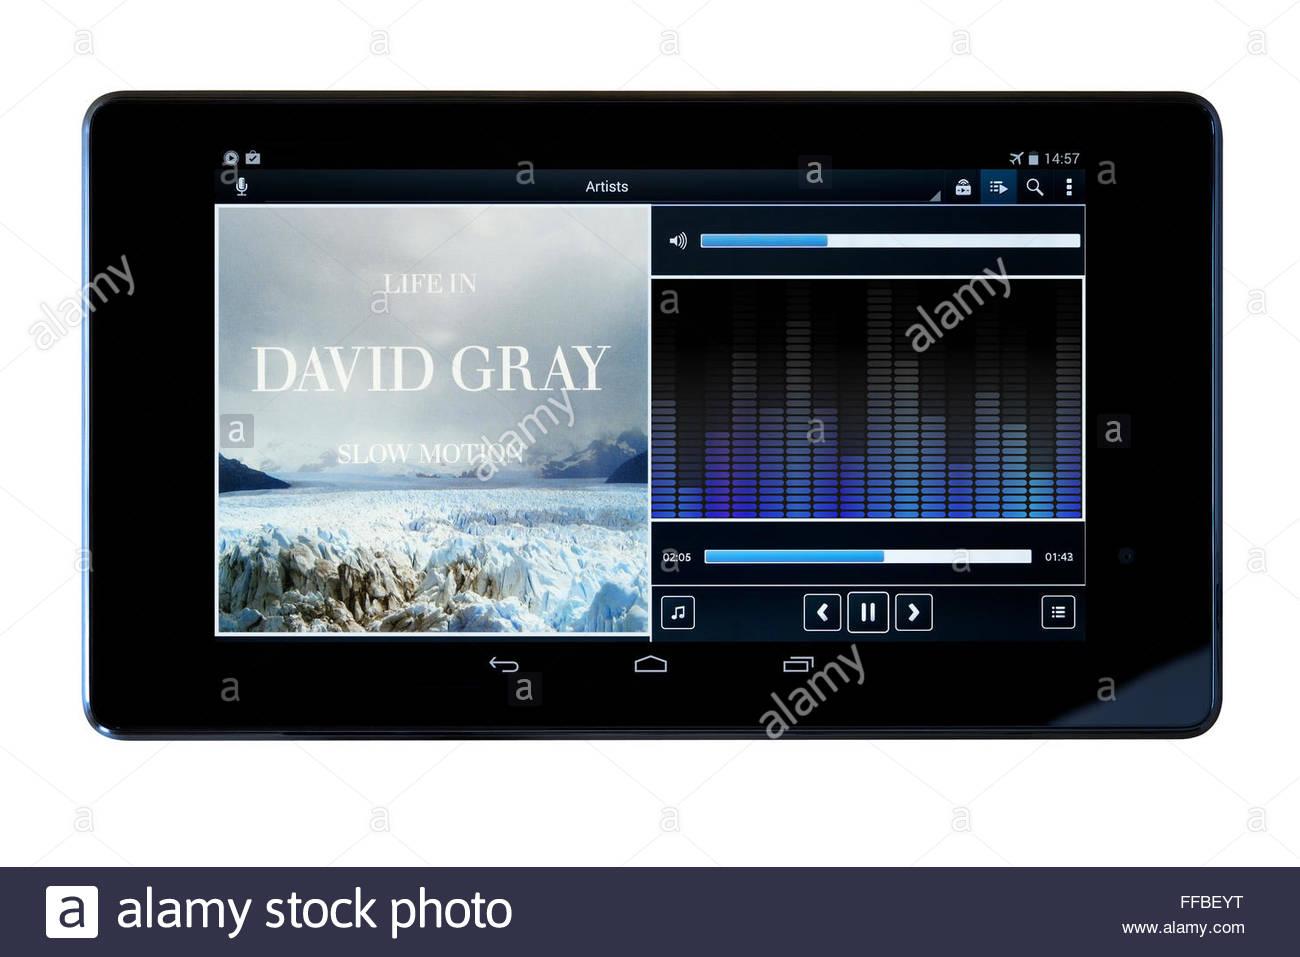 David Gray 2005 album Life in Slow Motion, MP3 album art on PC tablet, England Stock Photo